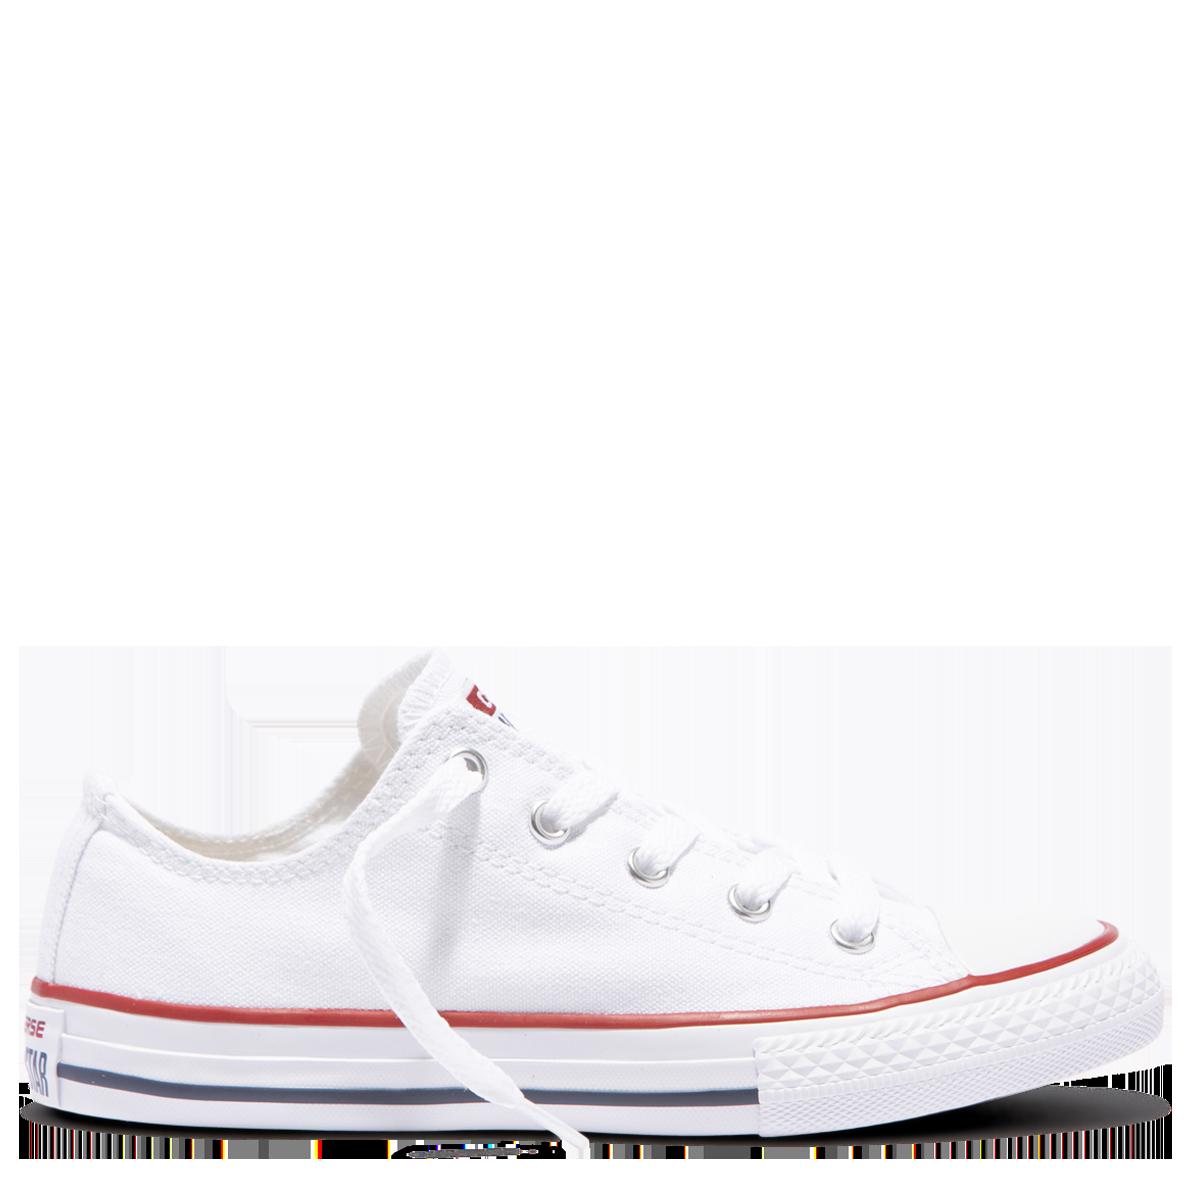 2b4295e7dd40 Converse Chuck Taylor All Star Junior Low Top- White. Price   59.99. Image 1